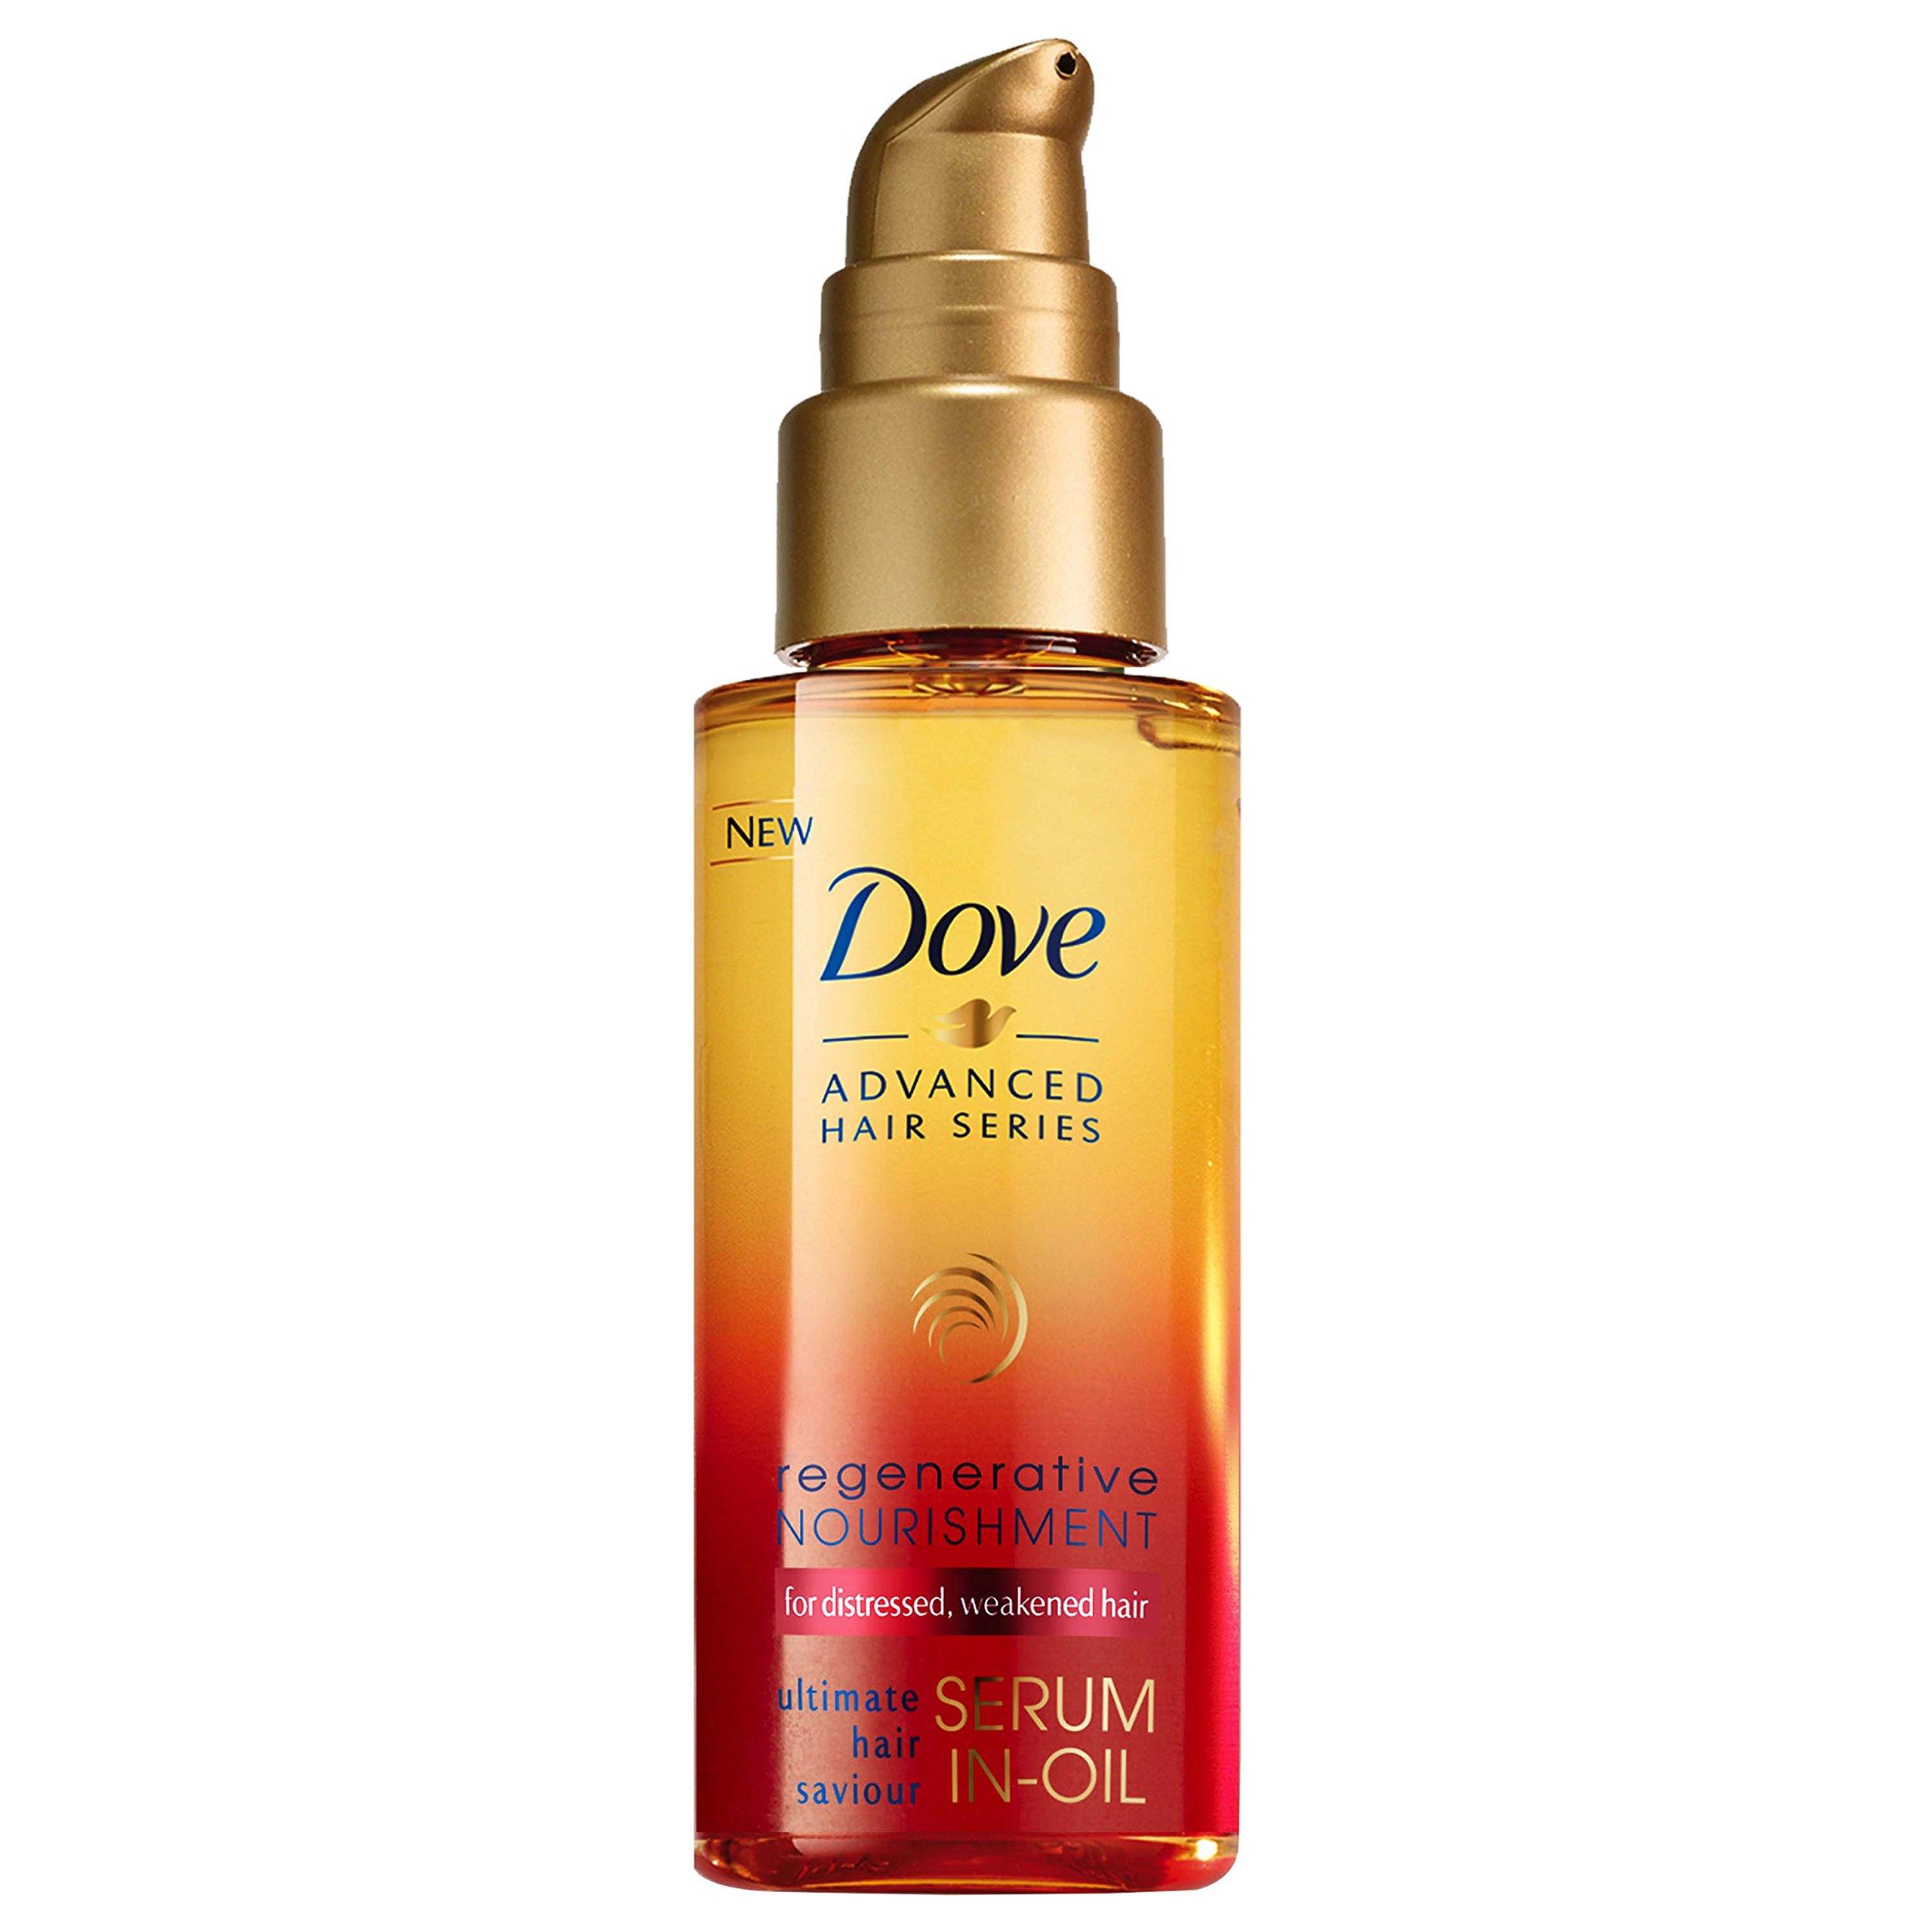 Dove Advanced Hair Series Serum-In-Oil, Regenerative Nourishment 1.69 oz